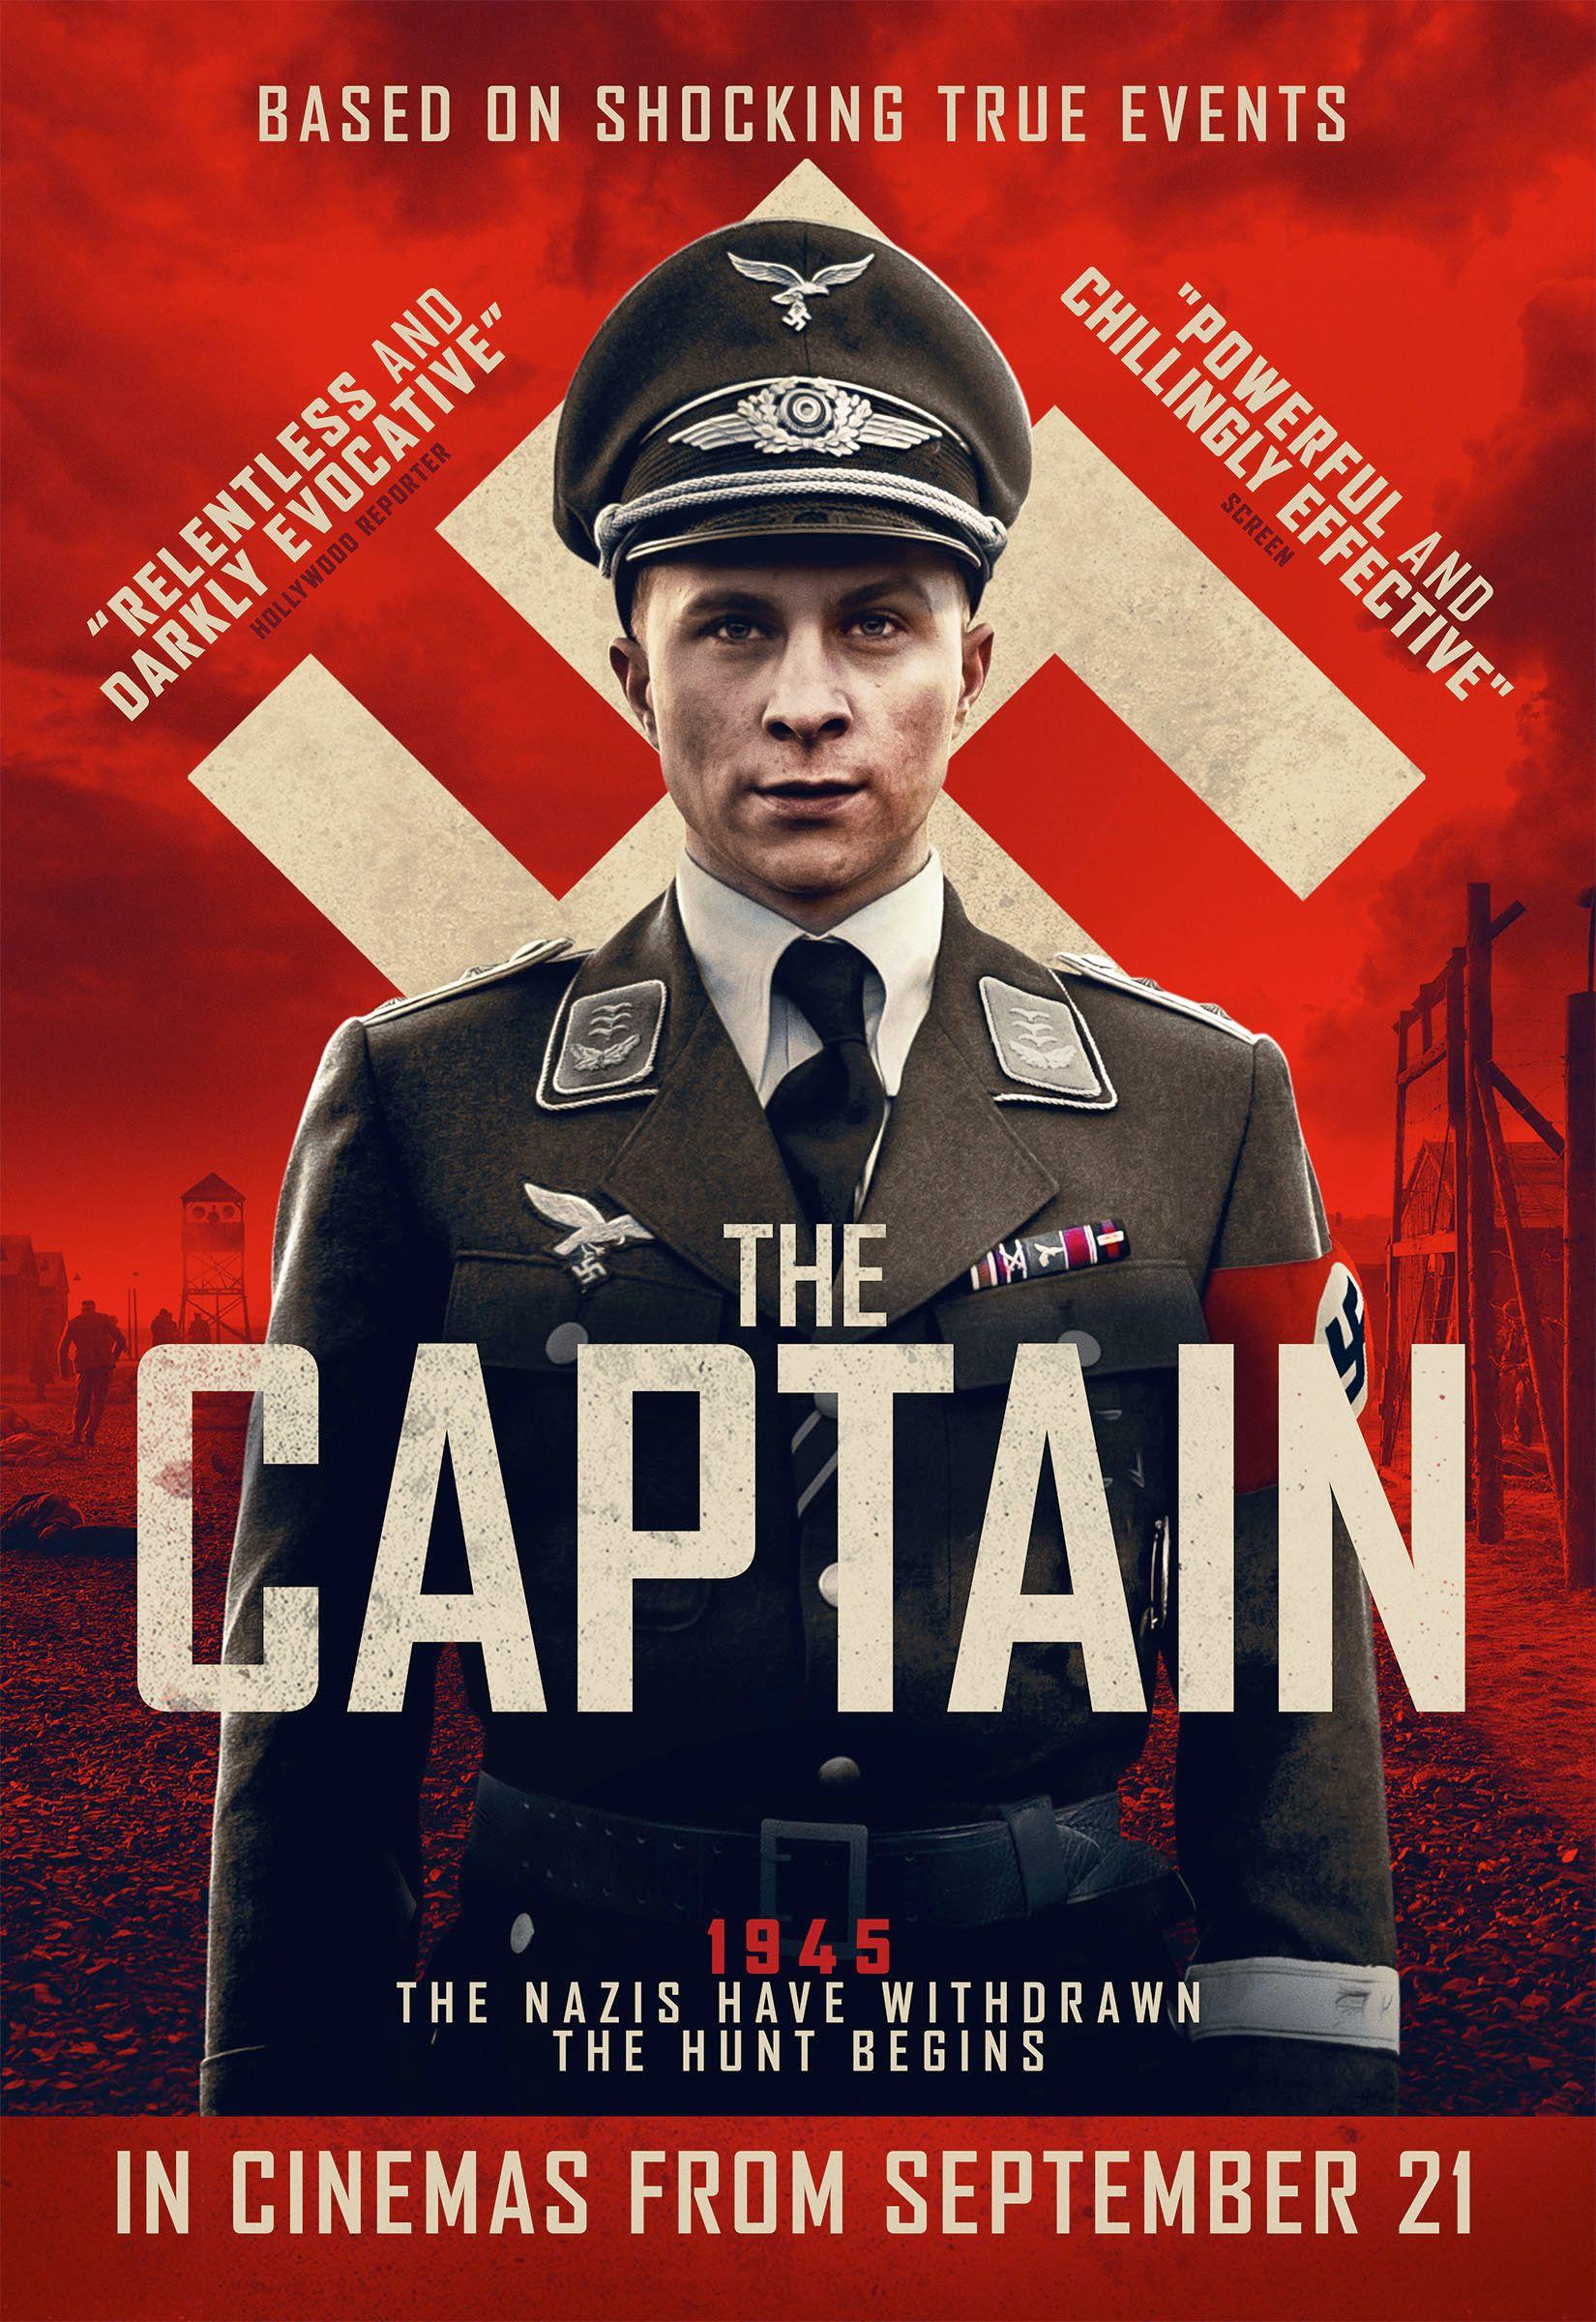 The Captain (2018) Streaming movies, Full movies, Movie tv